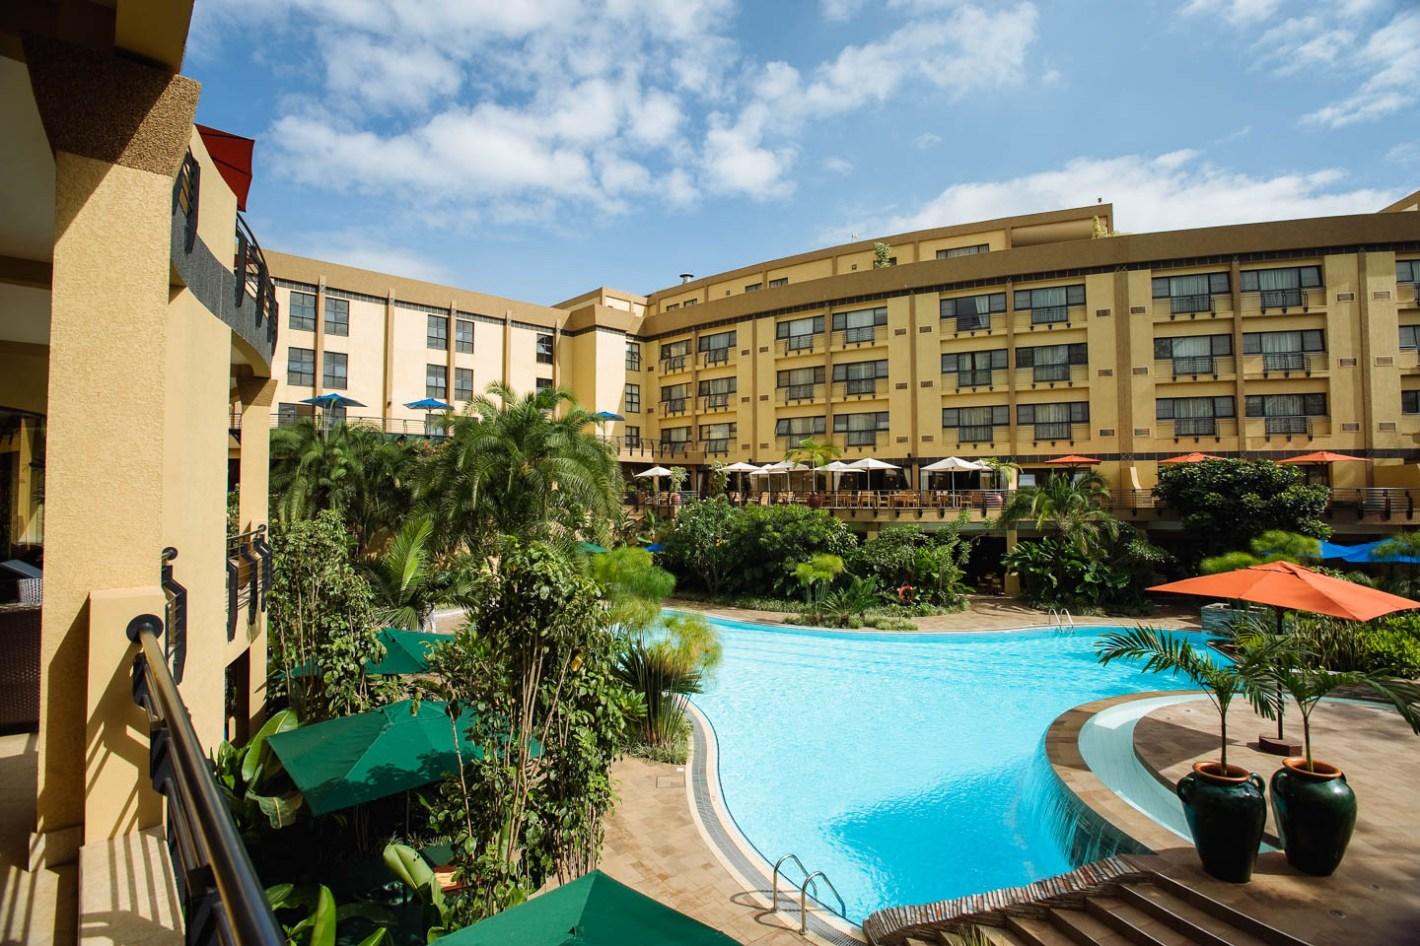 Kigali Serena Hotel Rwanda Timbuktu Travel